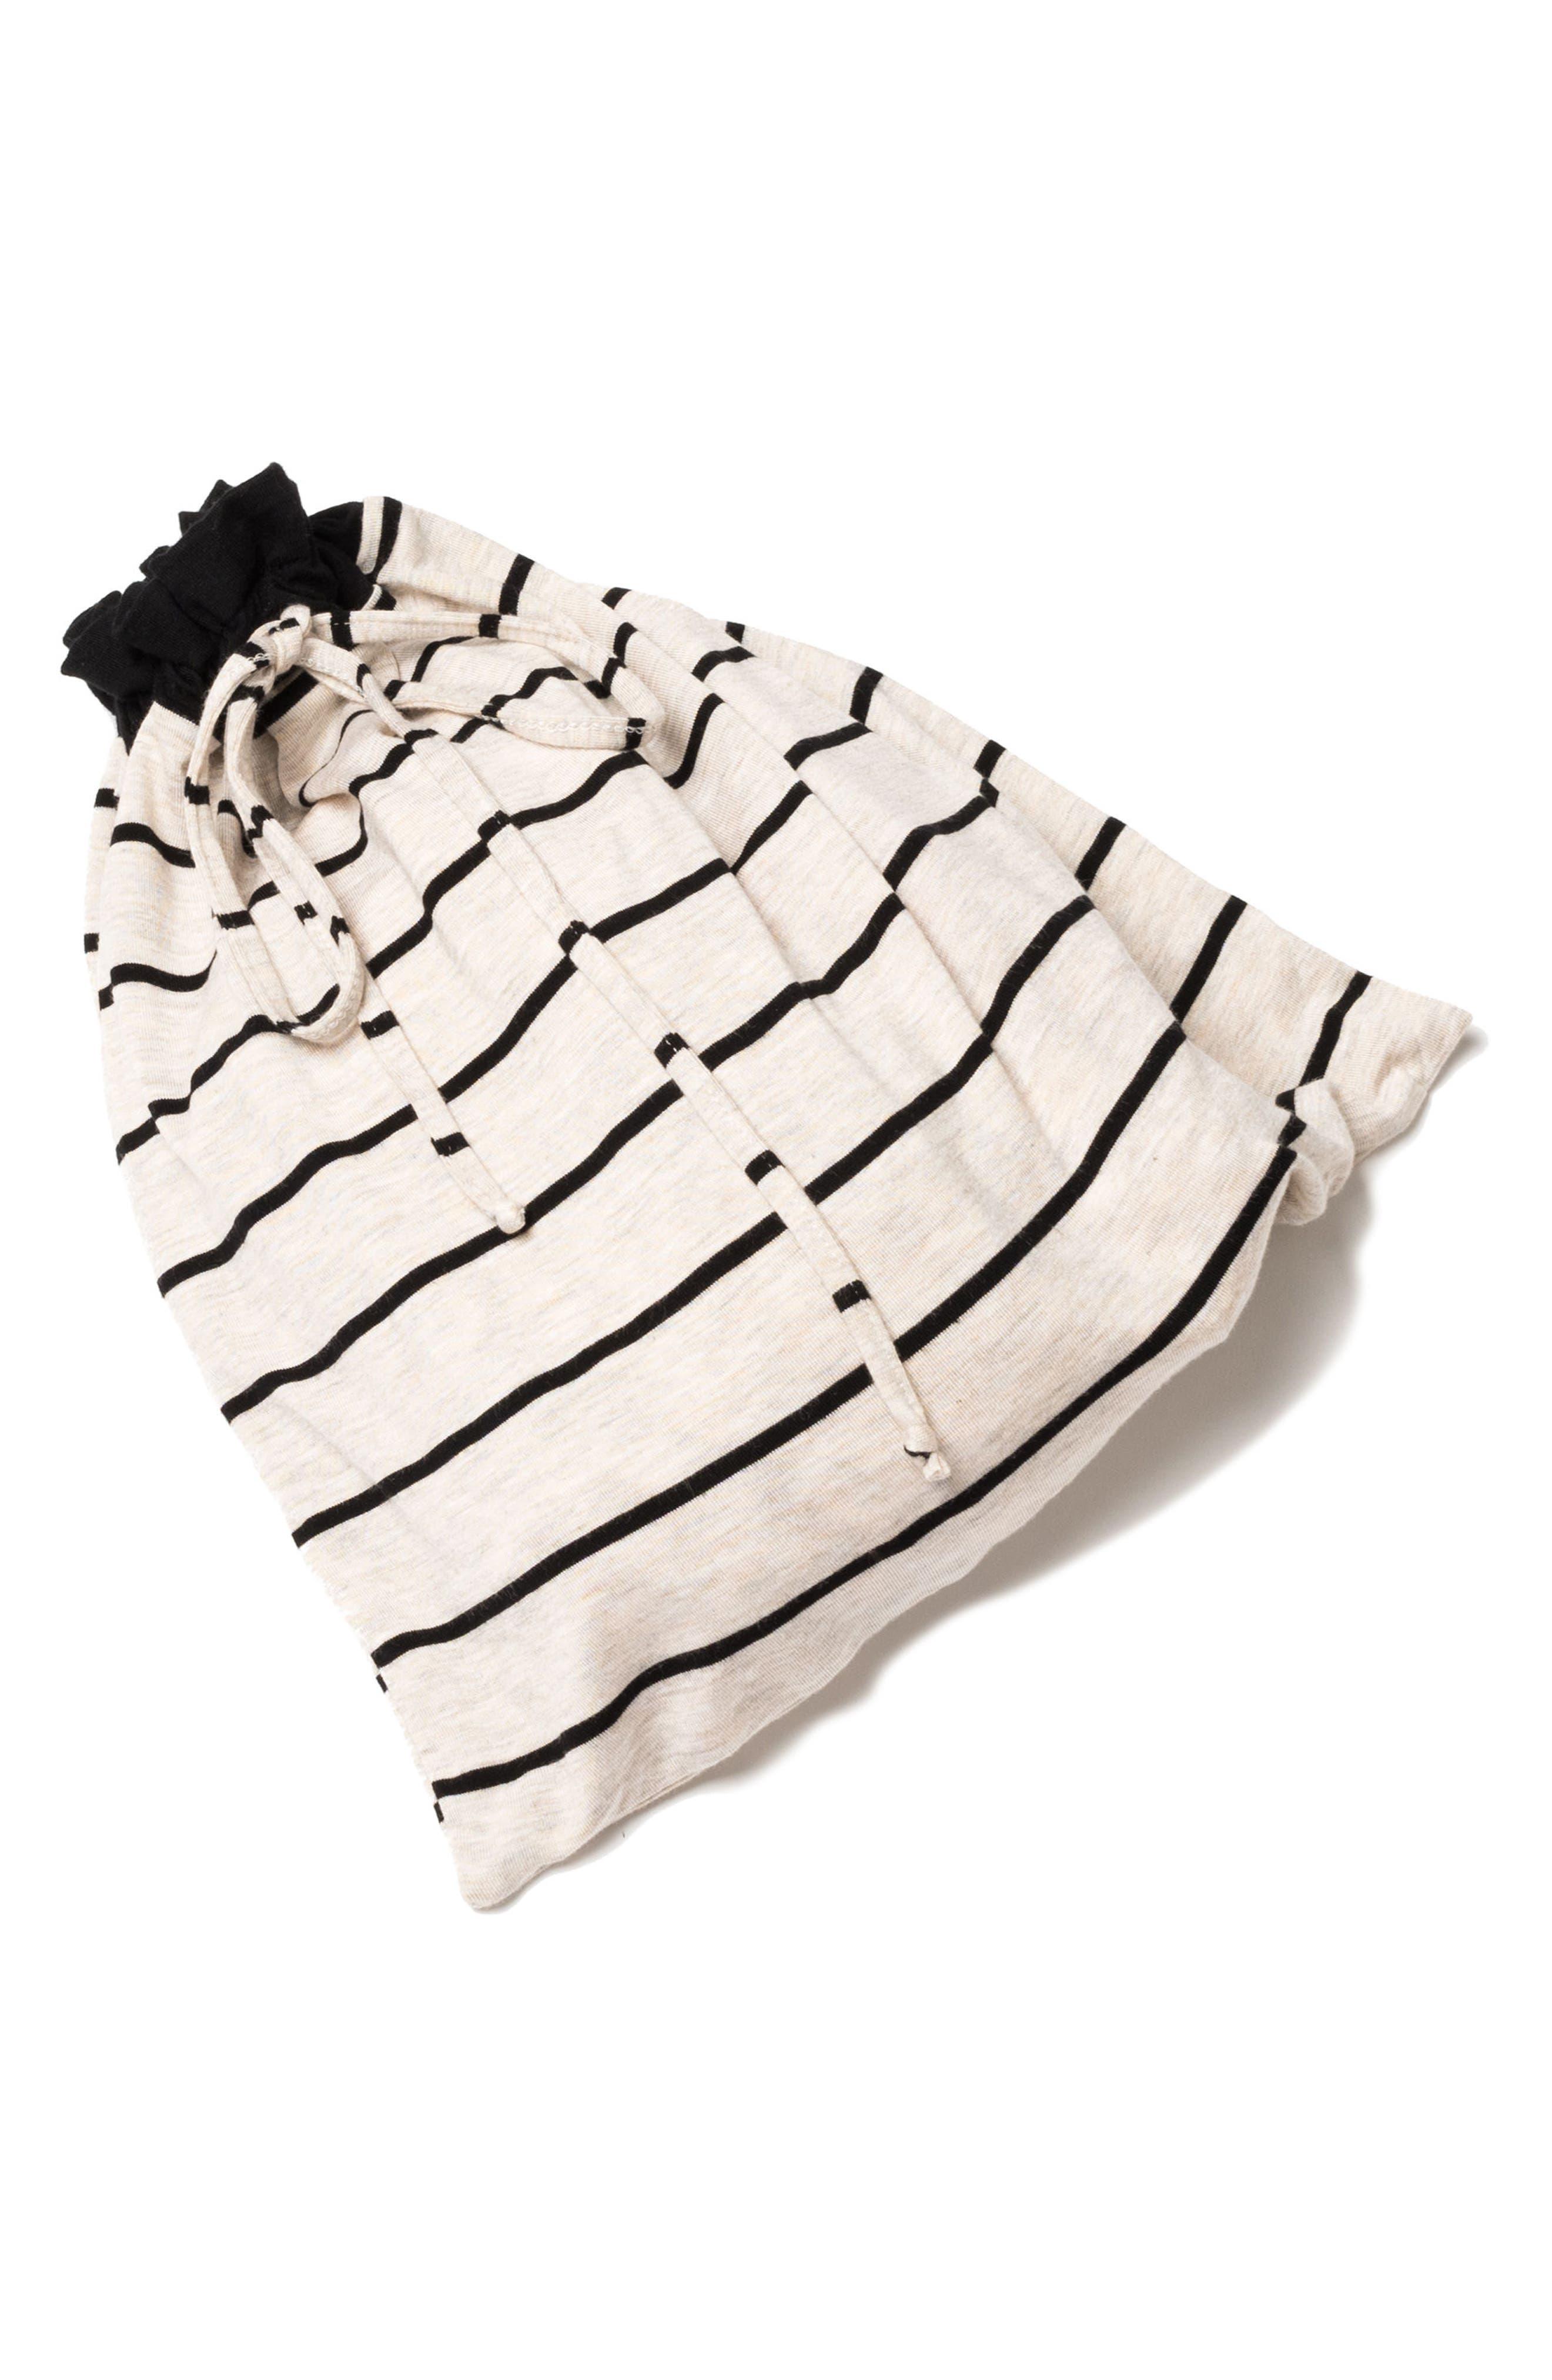 Roxanne - During & After 5-Piece Maternity Sleepwear Set,                             Alternate thumbnail 8, color,                             SAND STRIPE